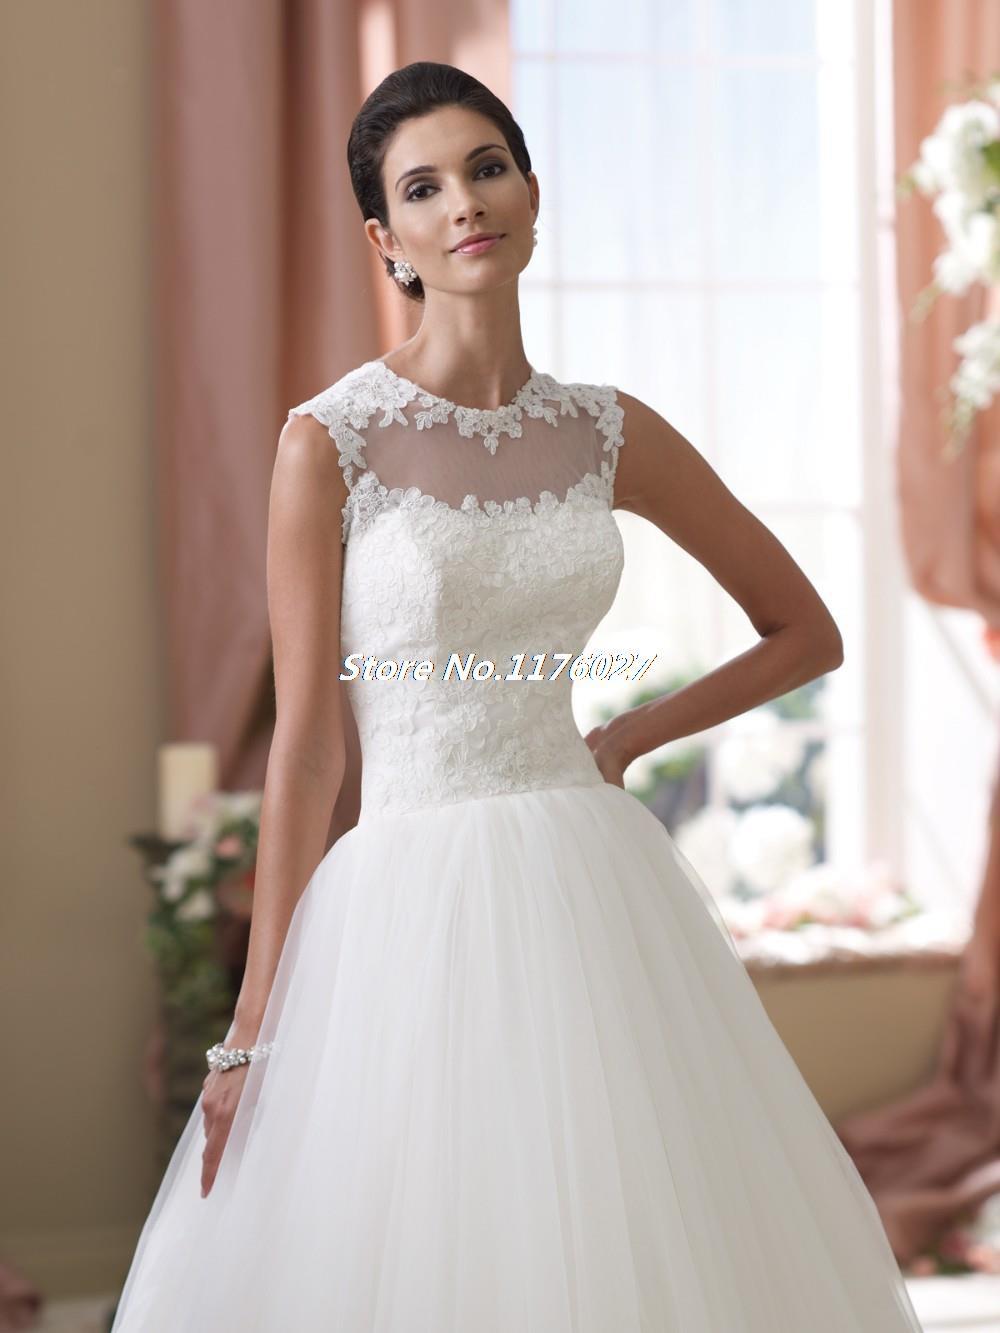 backless short wedding dresses for cheap short wedding dresses cheap Backless Short Wedding Dresses For Cheap